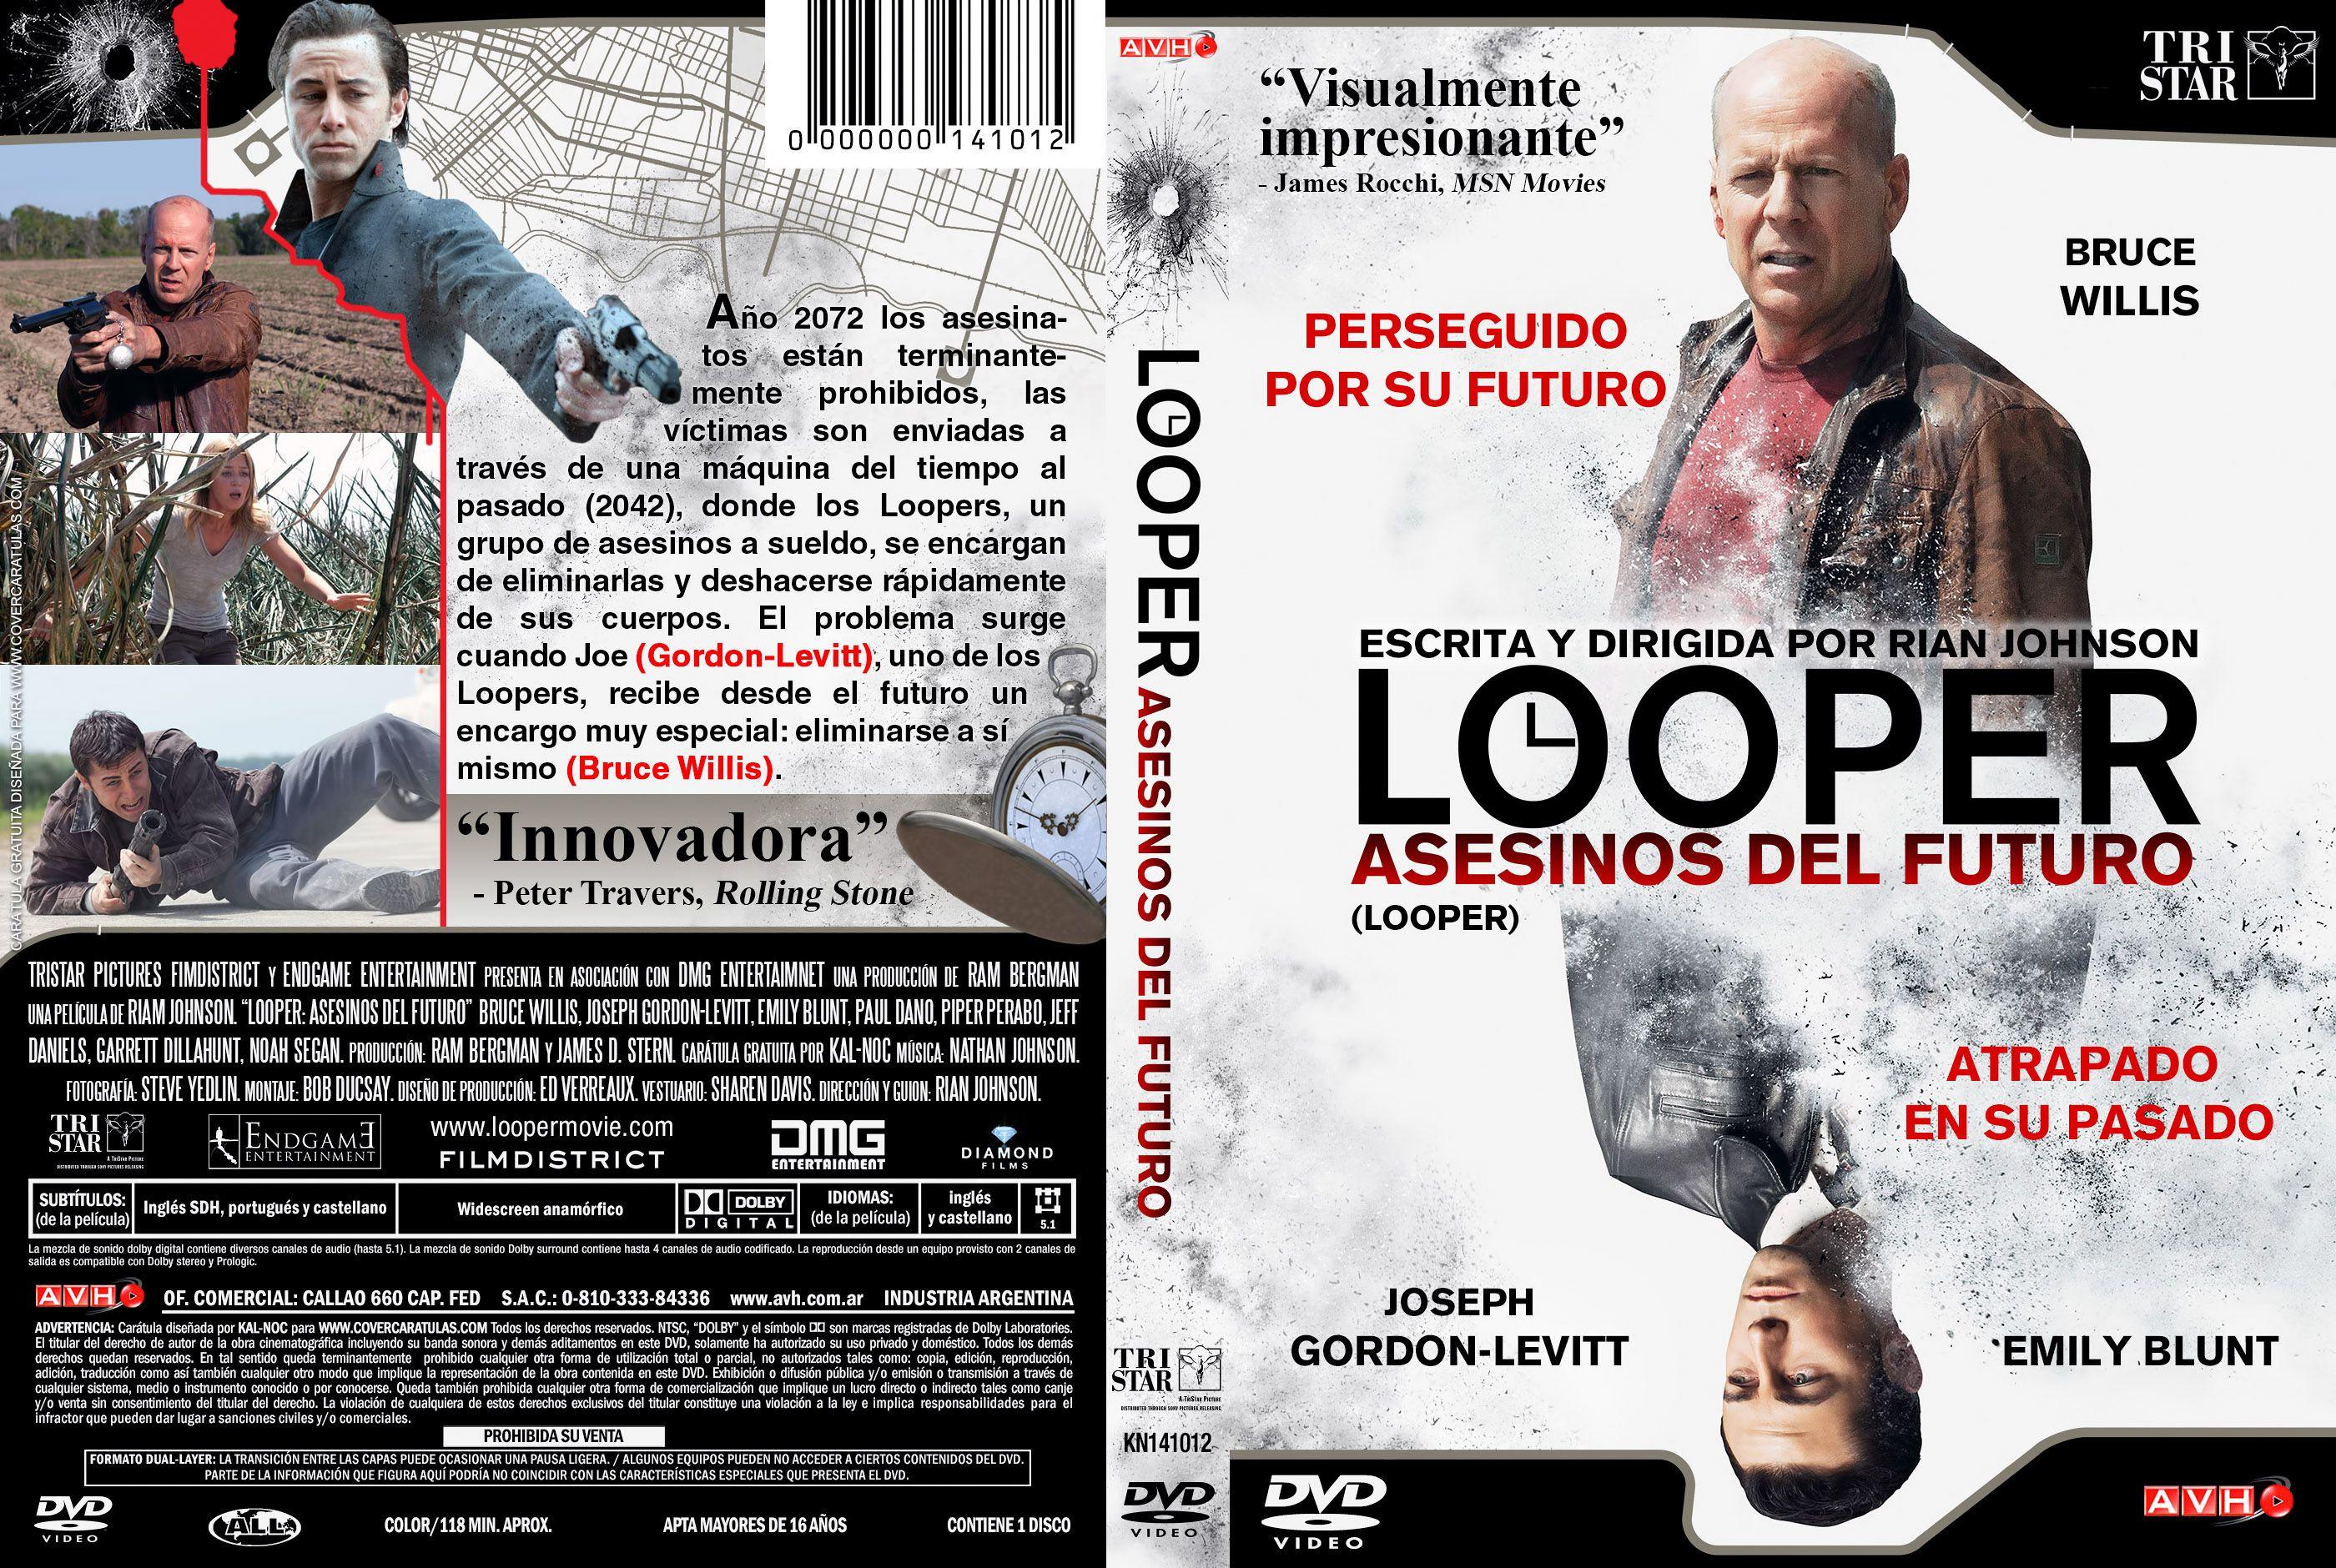 Looper: Asesinos del futuro (2012) [Dvdrip Latino]